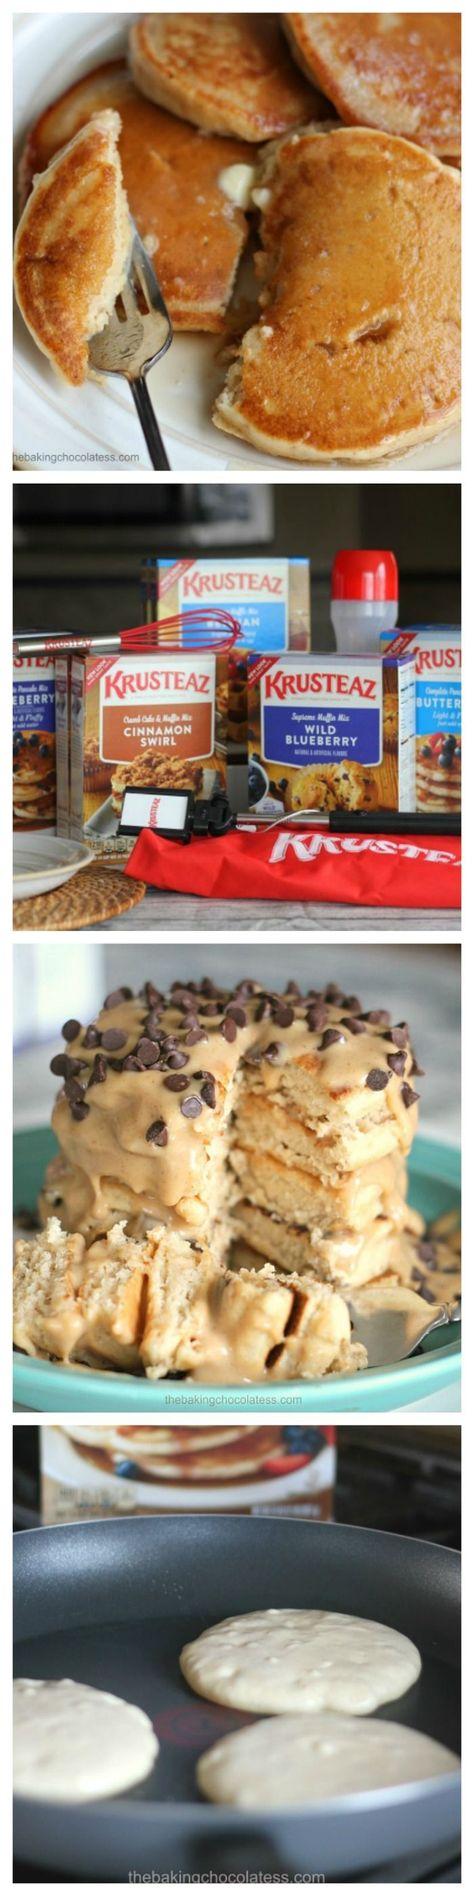 Breakfast for Dinner Month + Krusteaz Breakfast Night Prize Give-Away via /https/://www.pinterest.com/BaknChocolaTess/